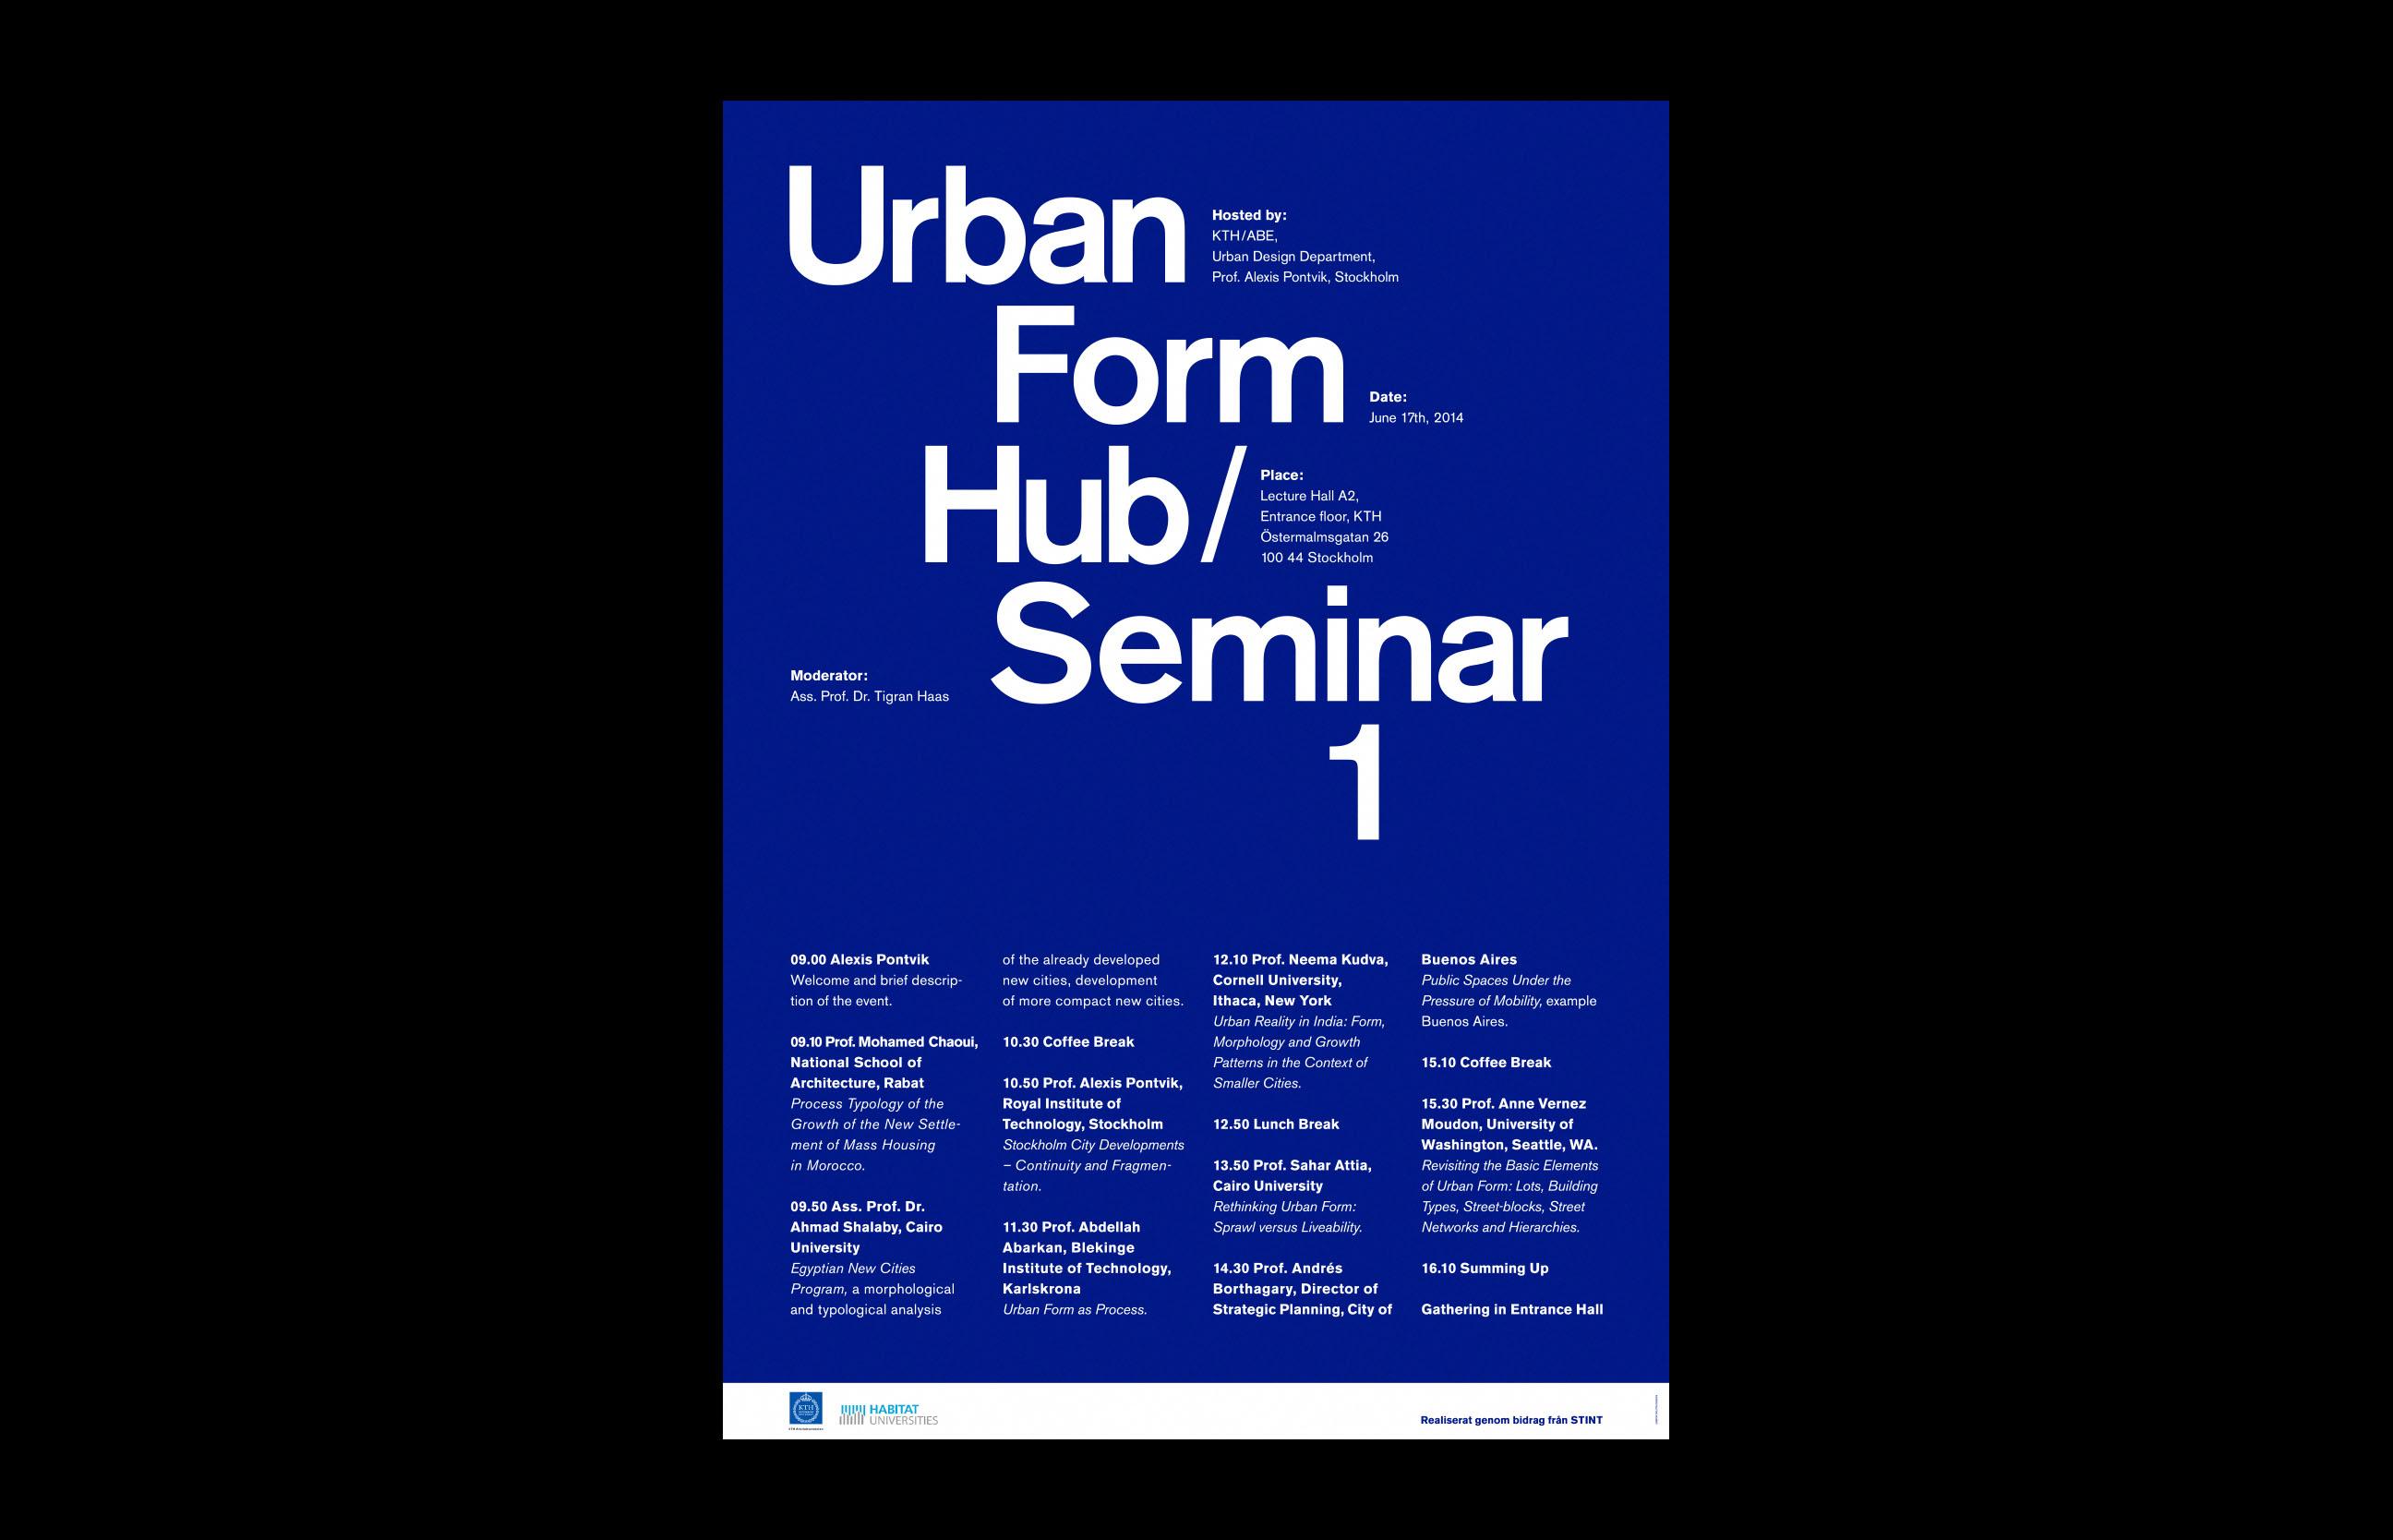 Urban Form Hub Seminar